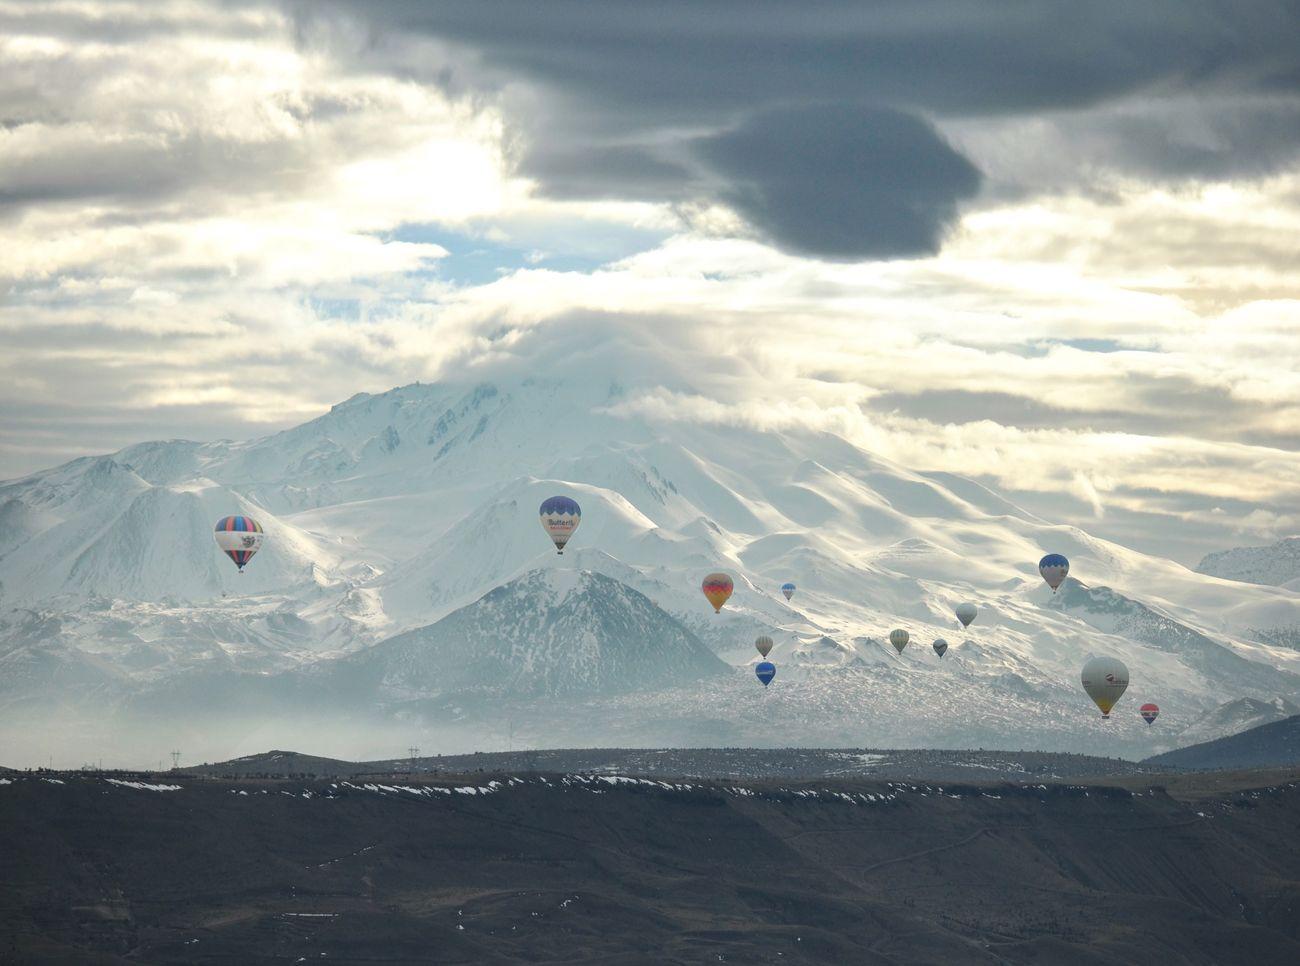 Hot air balloons flying against sky at cappadocia during sunrise